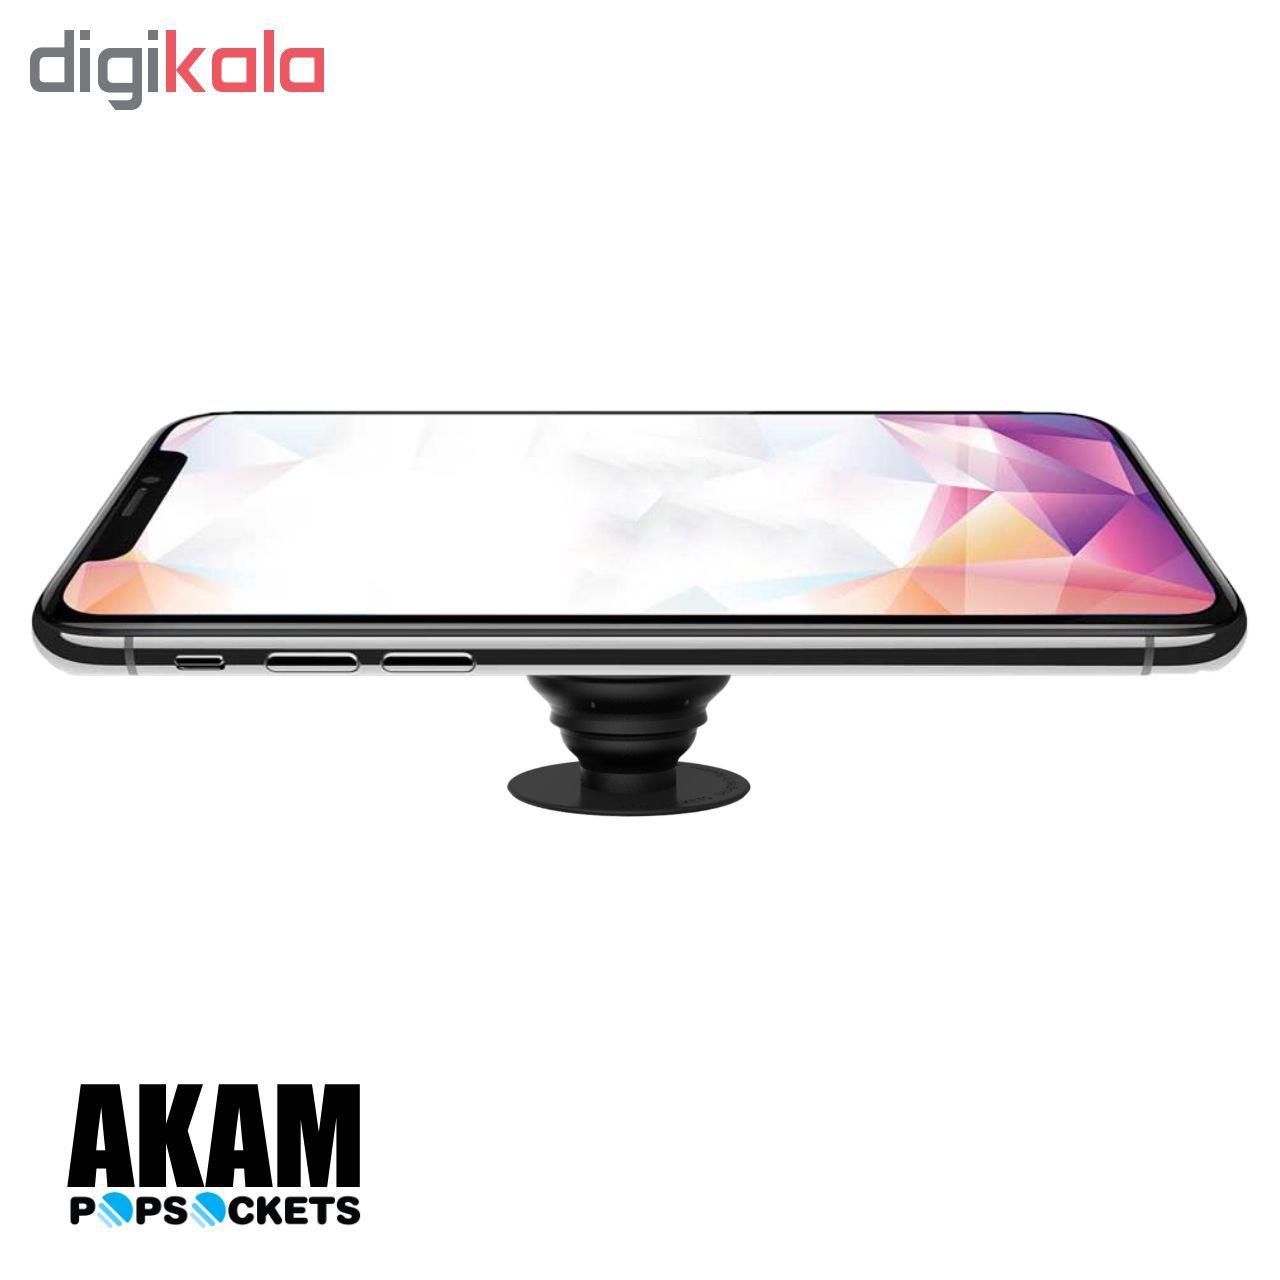 پایه نگهدارنده گوشی موبایل پاپ سوکت آکام مدل APS0101 main 1 5